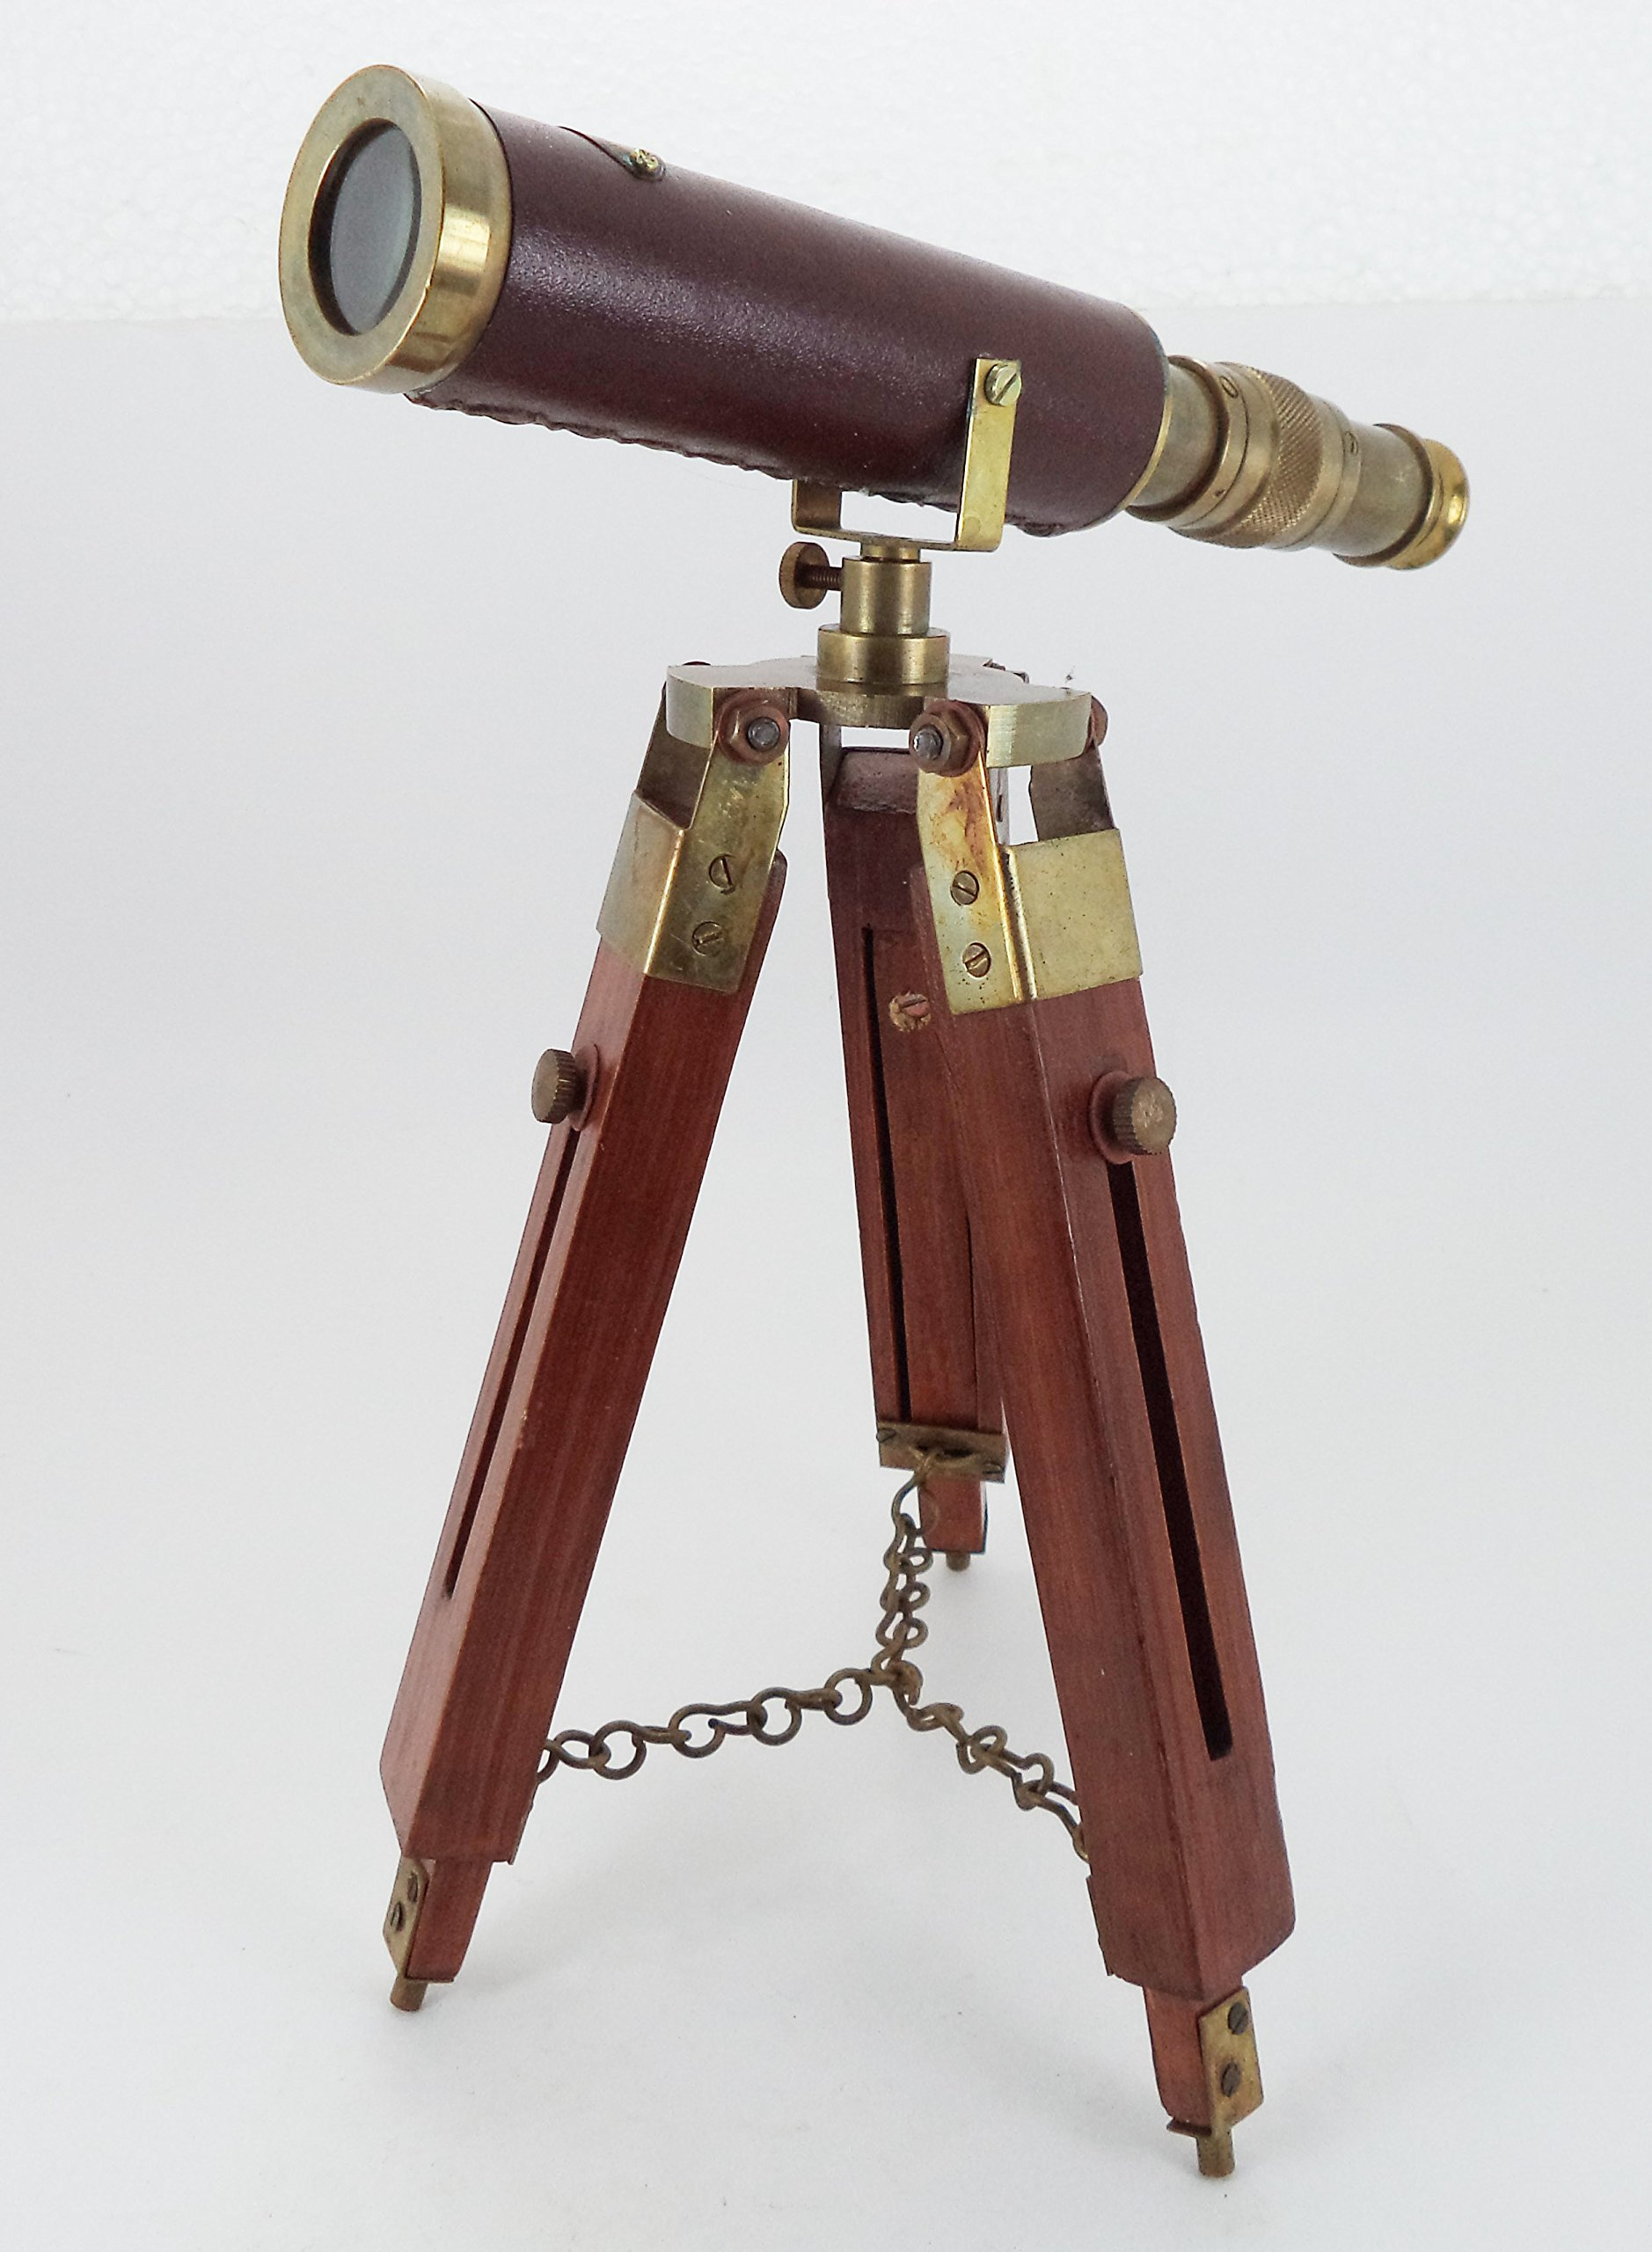 Dorpmarket Brass Desk Telescope with Adjustable Wooden Tripod Spyglass Handmade